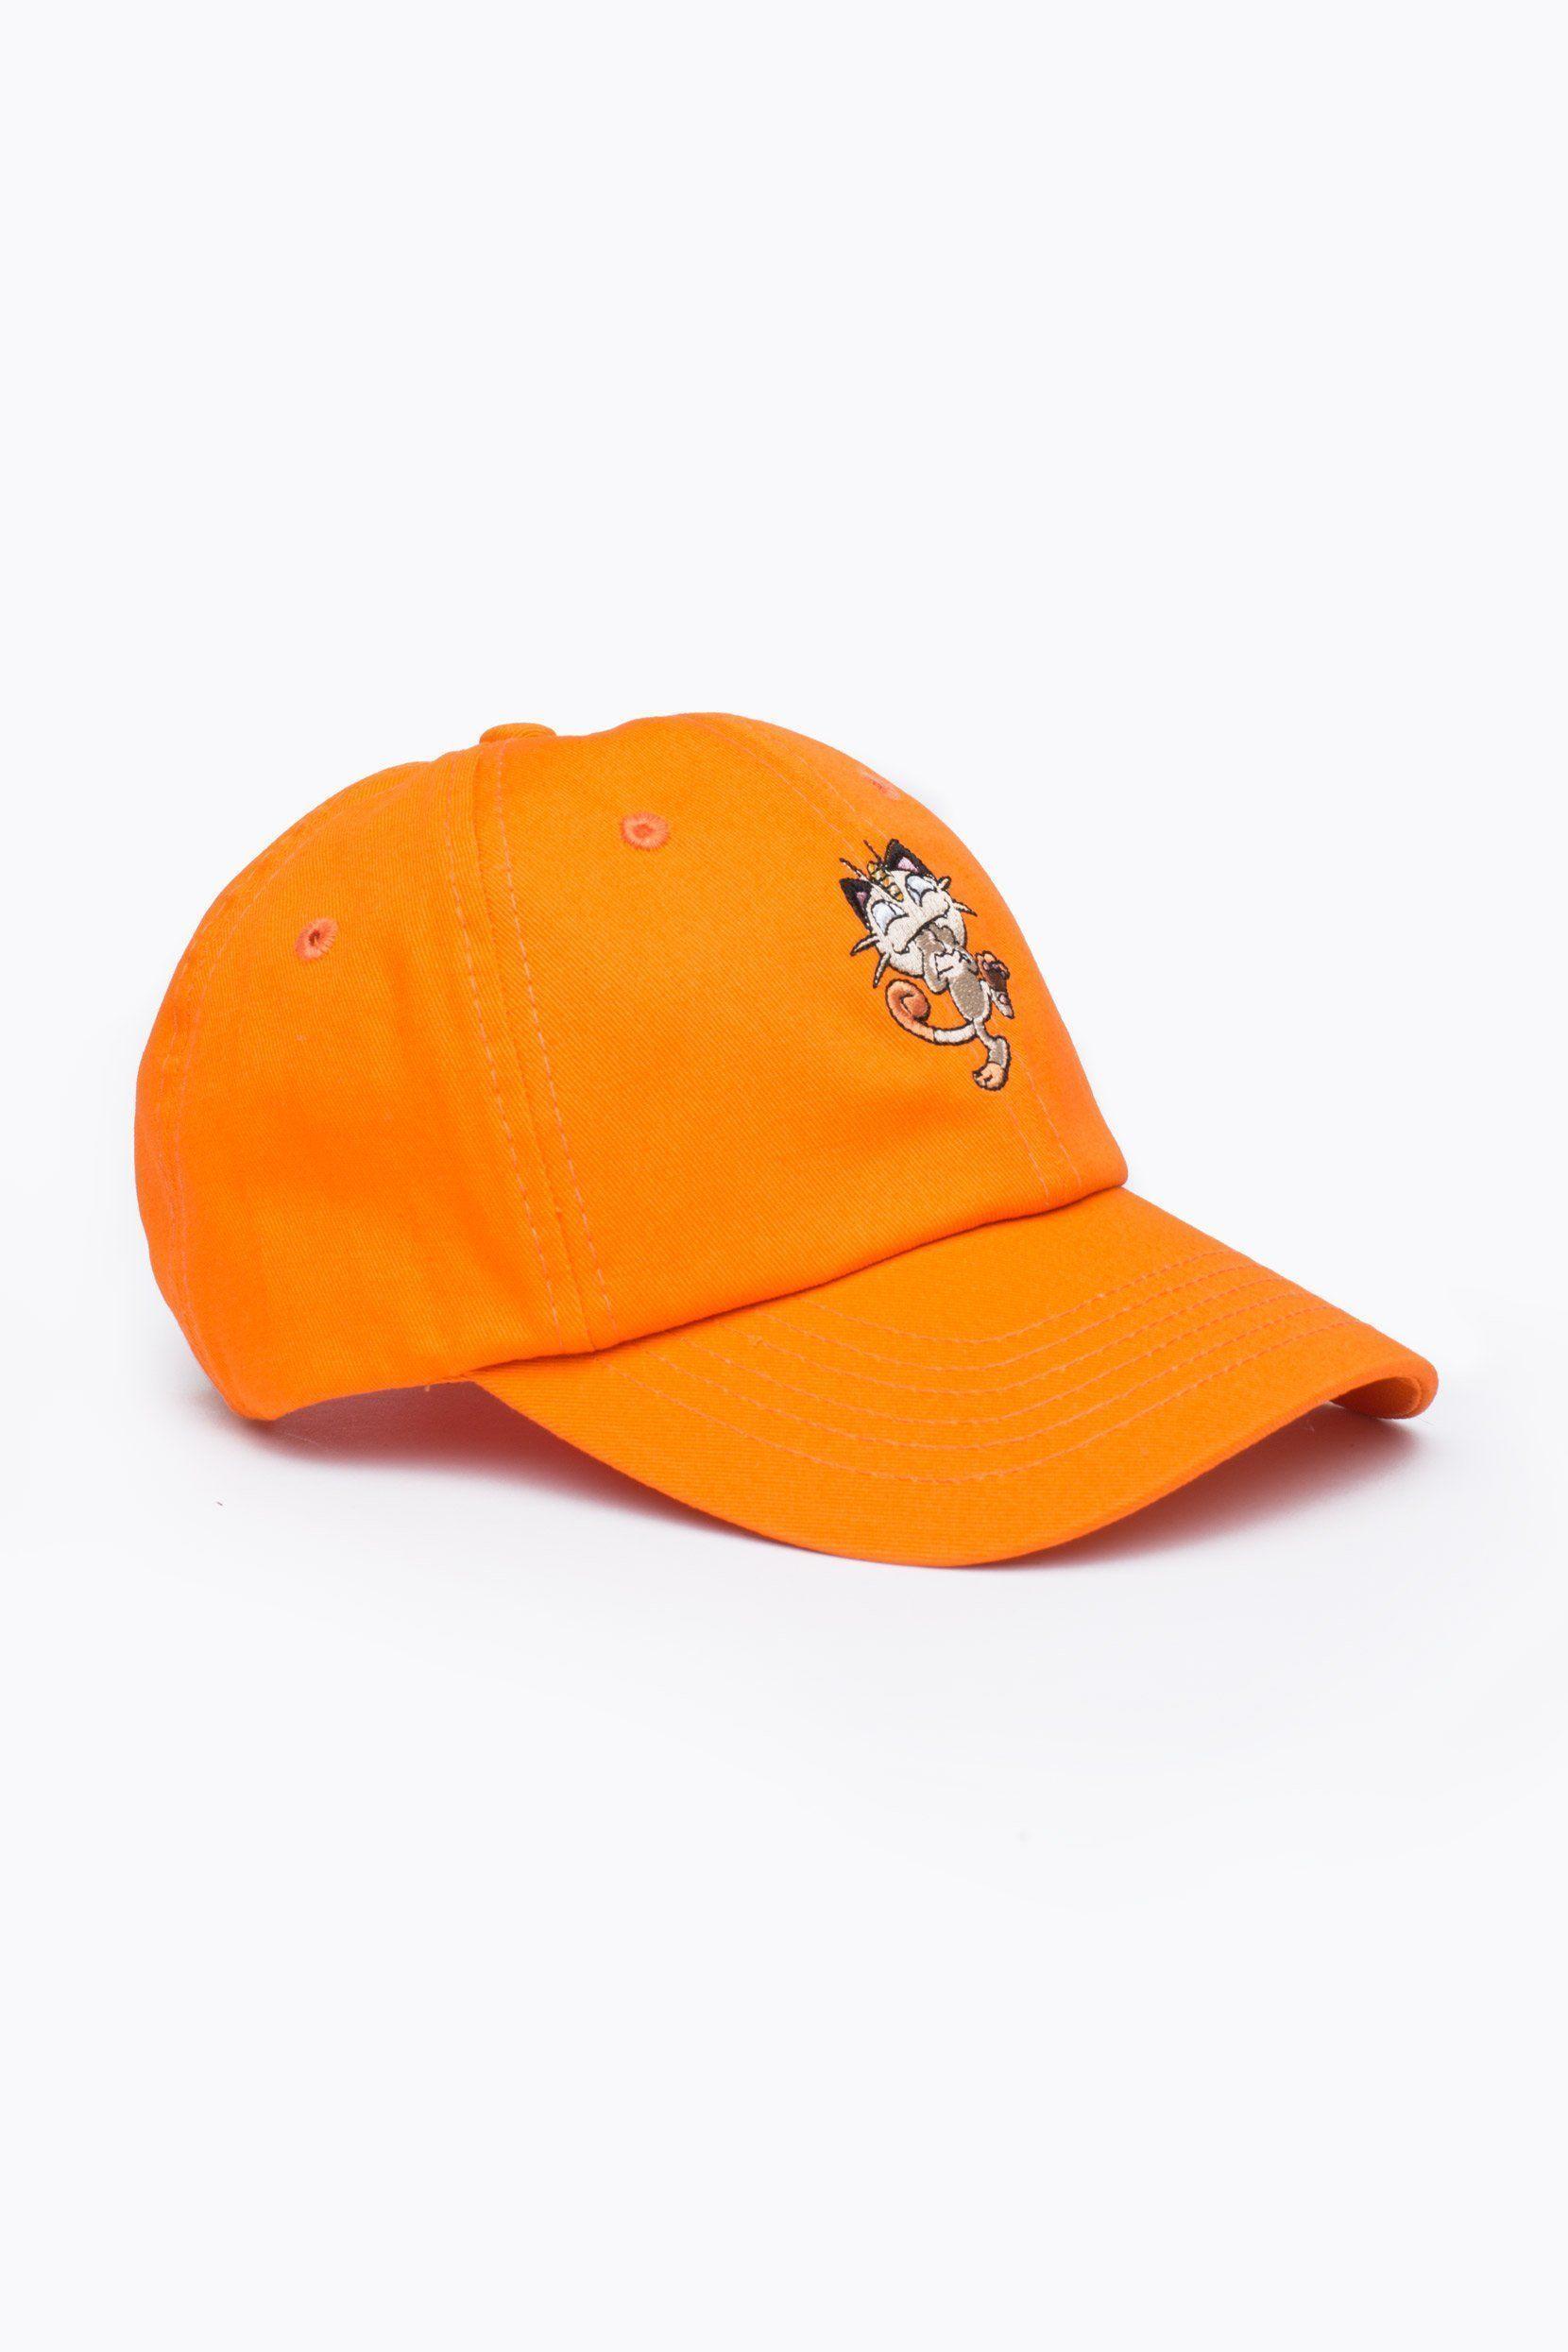 HYPE X Pokemon Orange Meowth Dad Hat